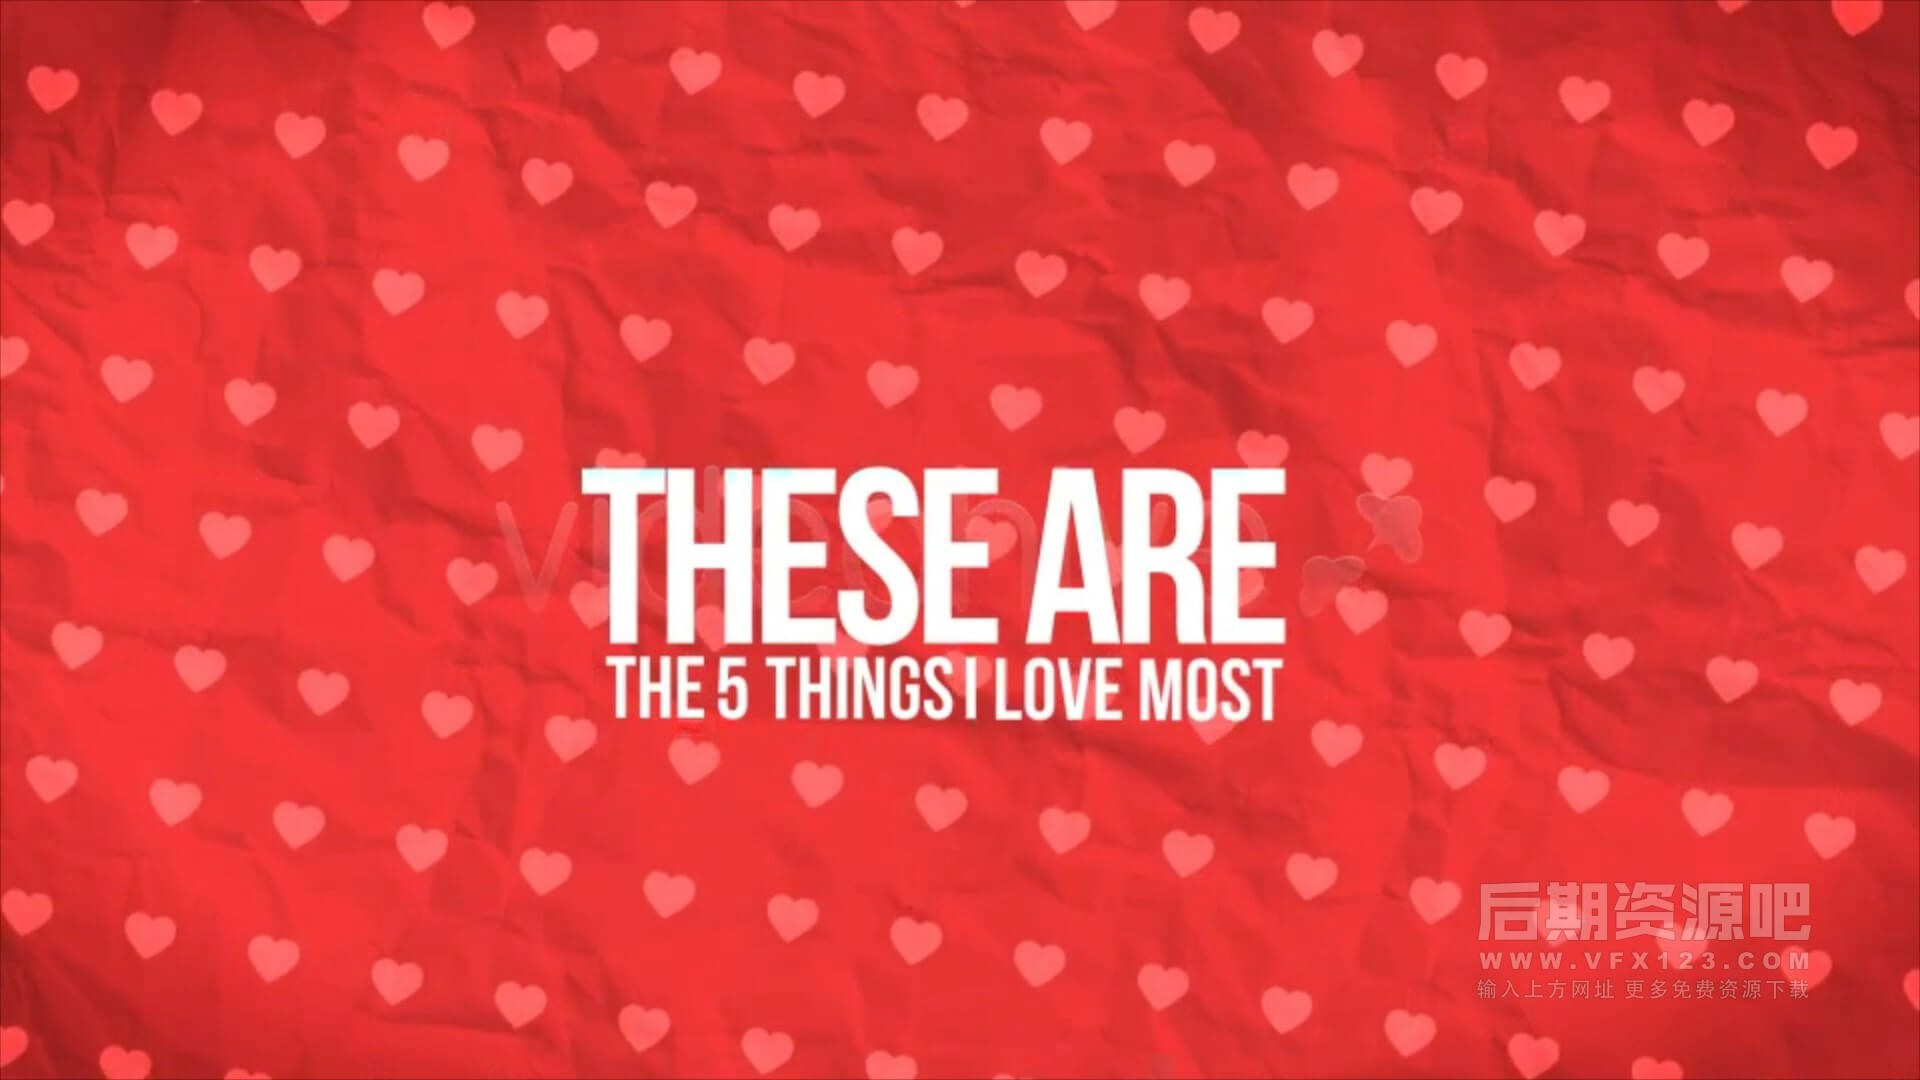 Motion模板 可爱甜心表白爱情相册模板 Five Things I Love